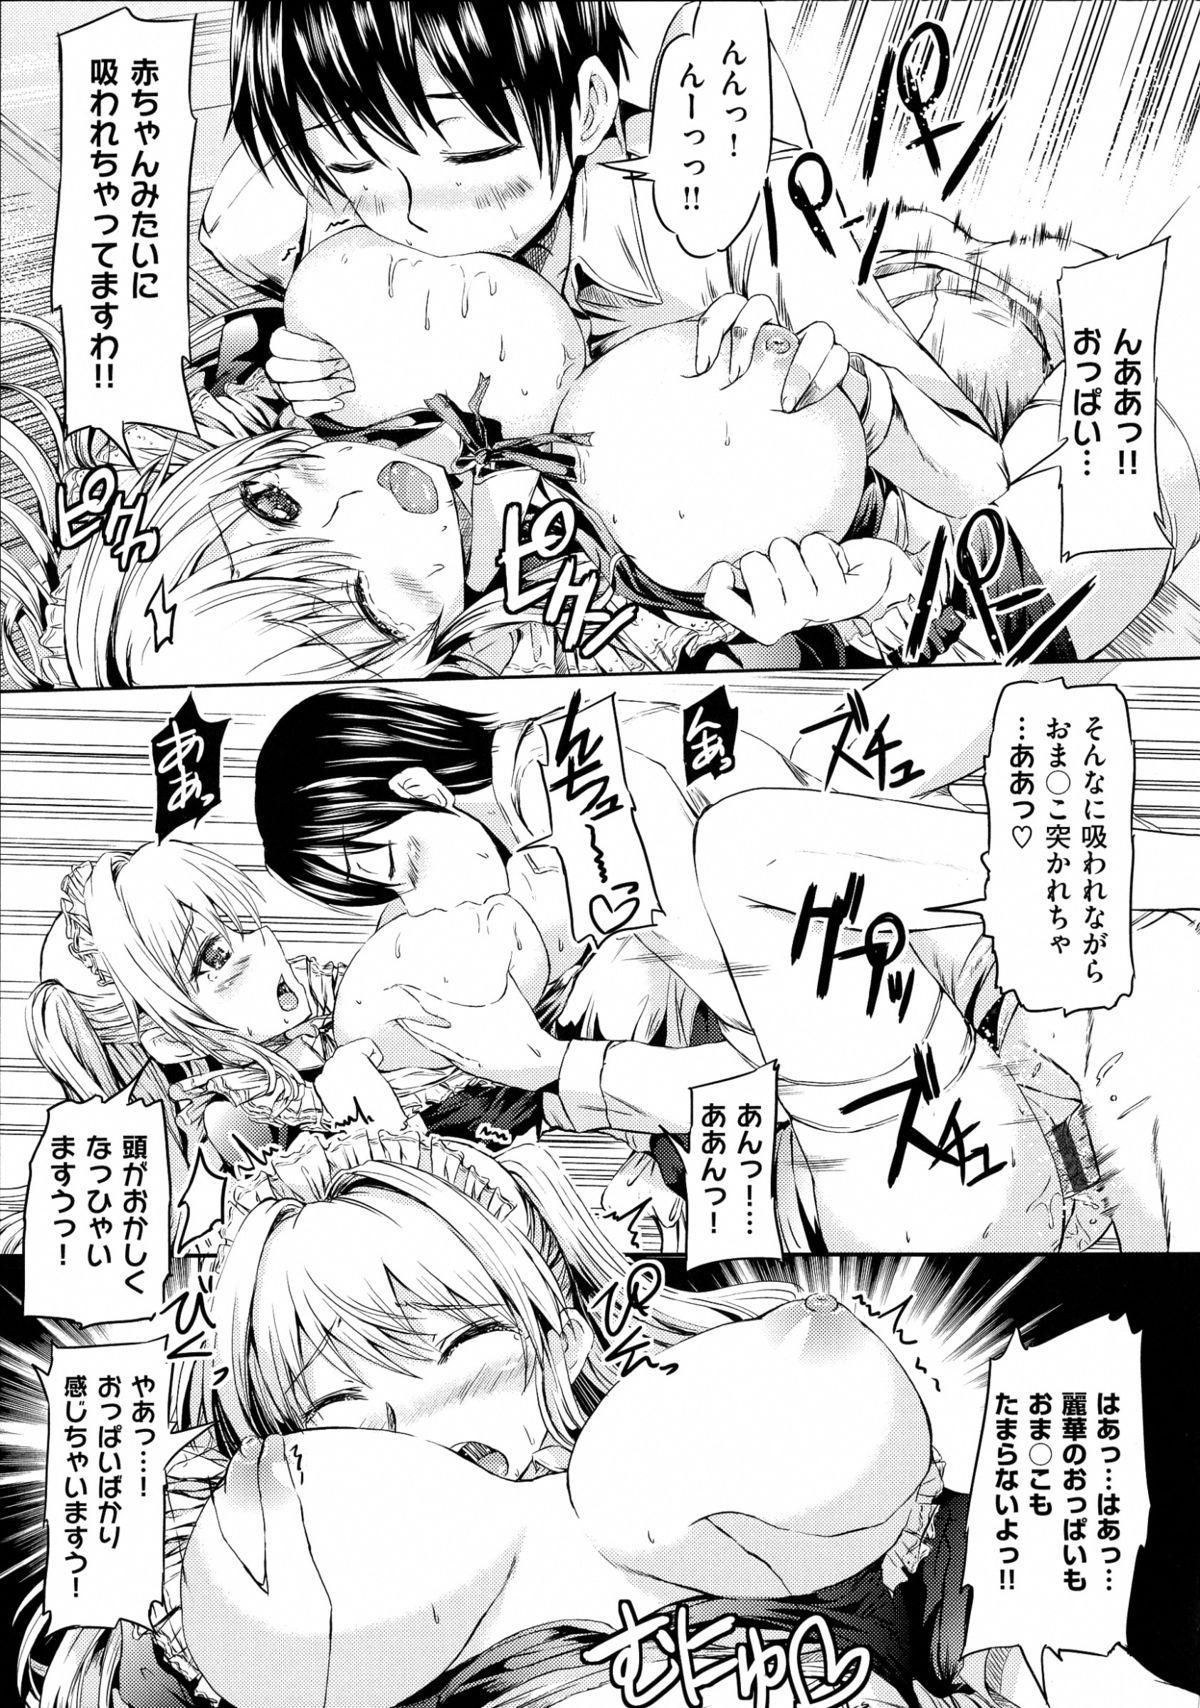 Ojousama no Maid Jijou 159